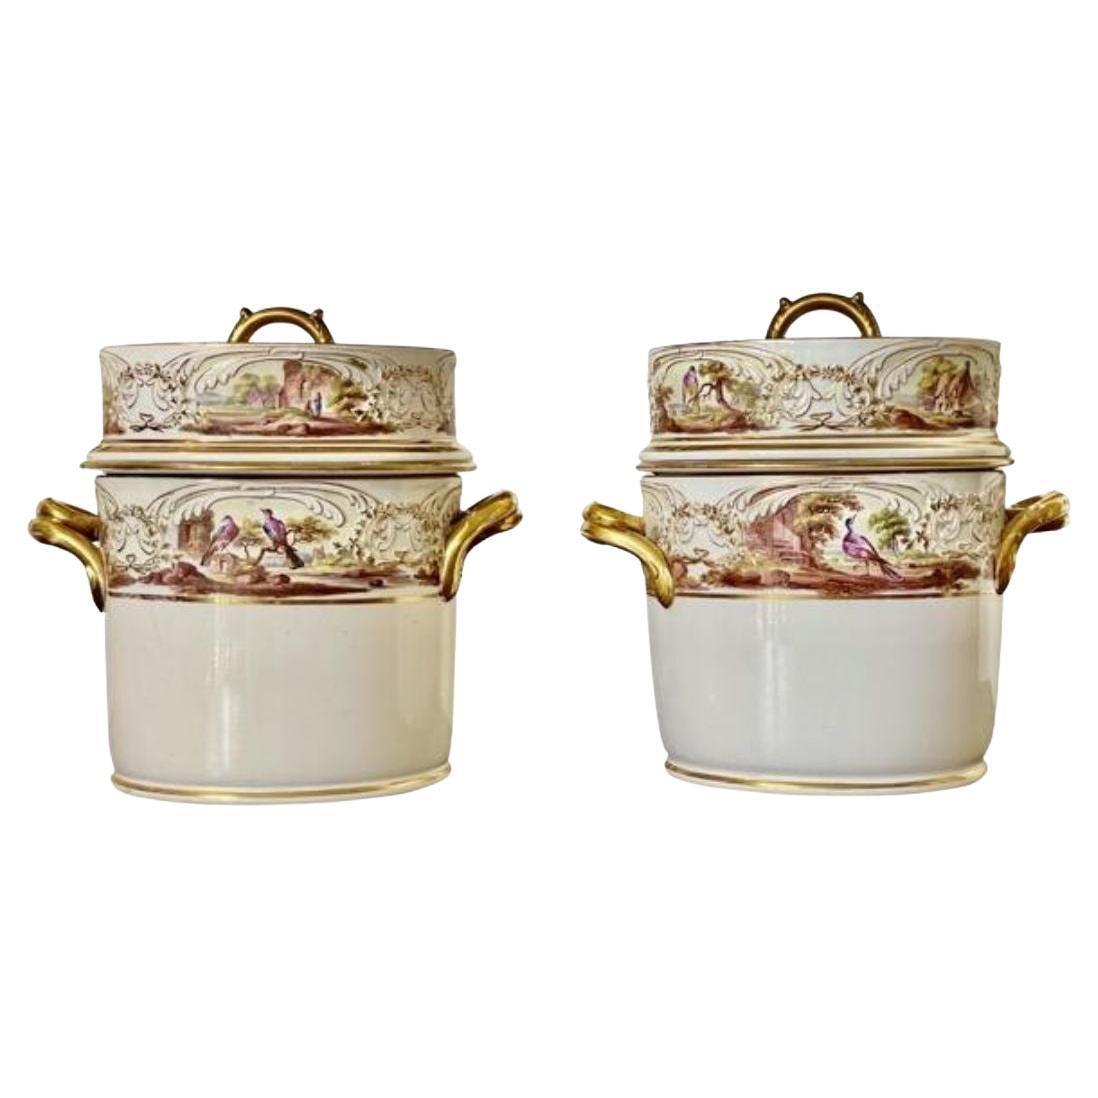 Exceptional English Regency Porcelain Fruit Coolers, Circa 1810